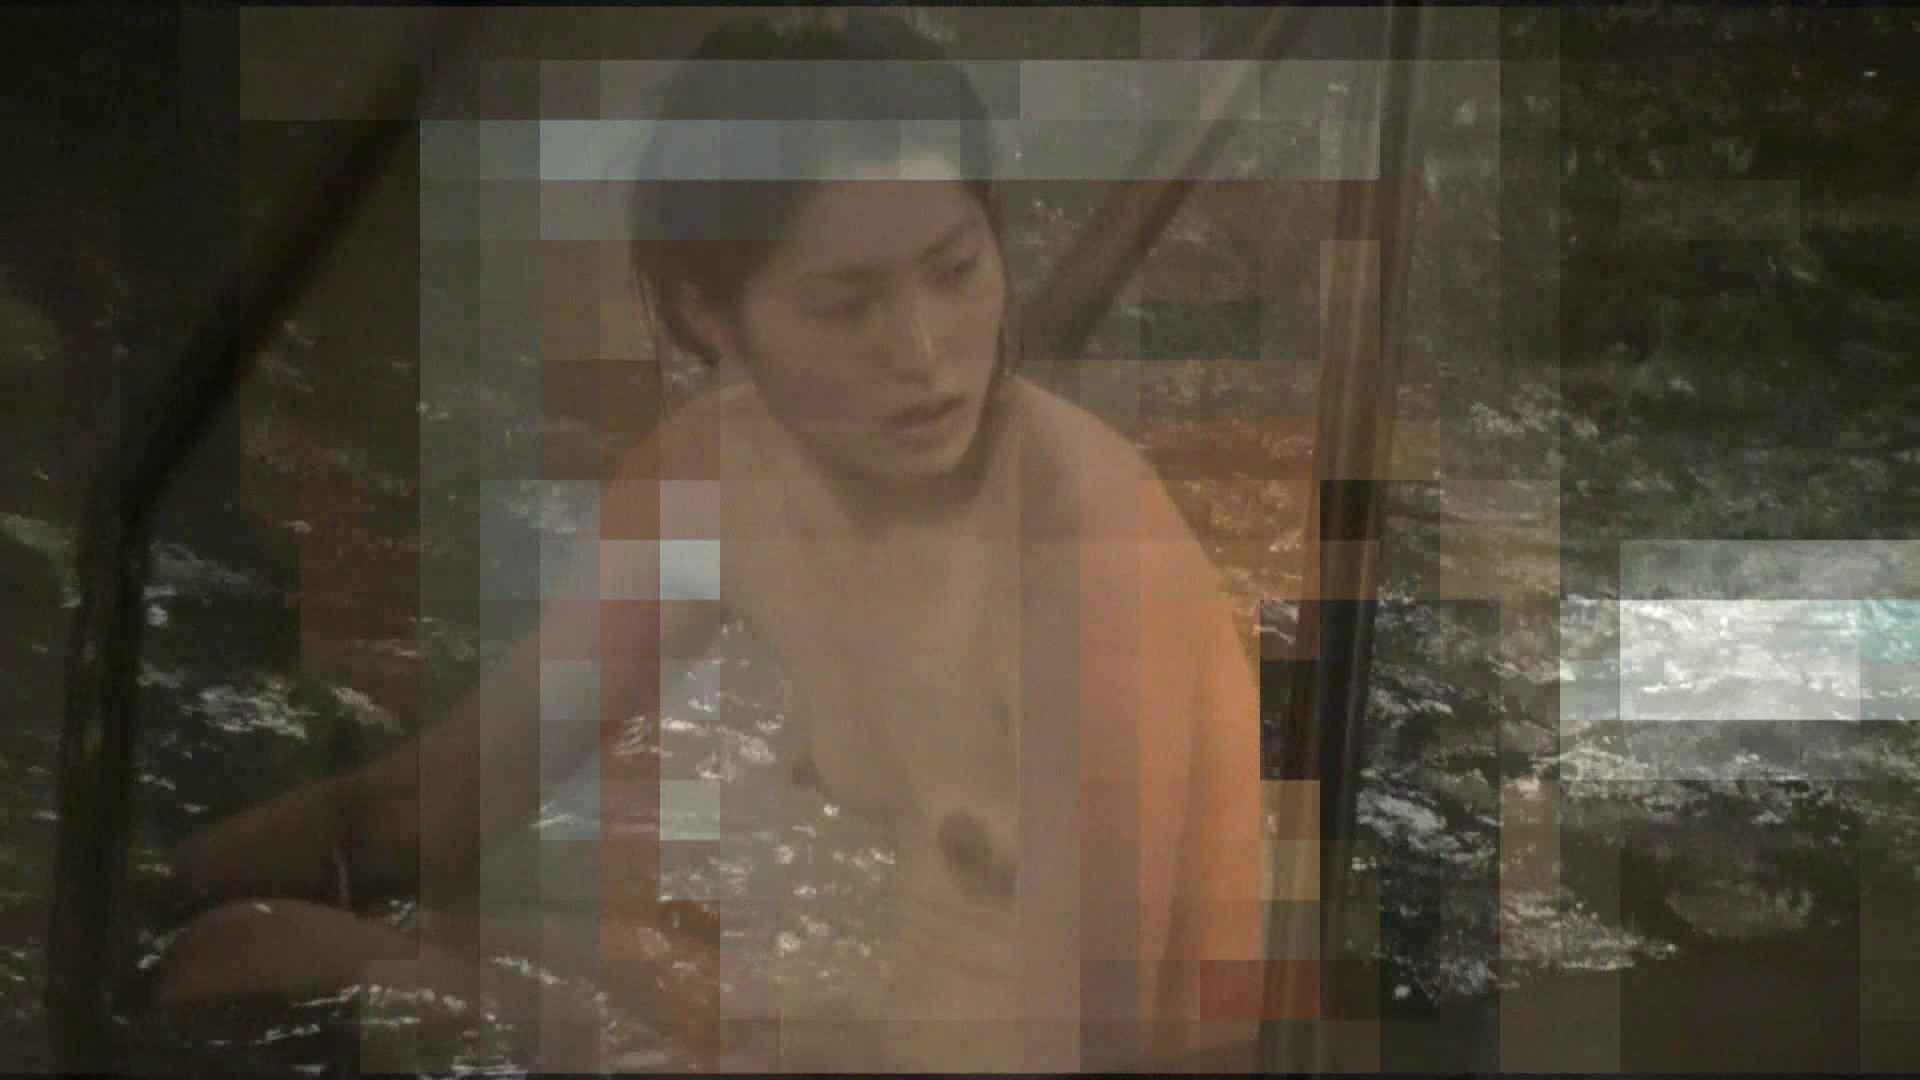 Aquaな露天風呂Vol.406 露天風呂 | OLのエロ生活  66連発 16